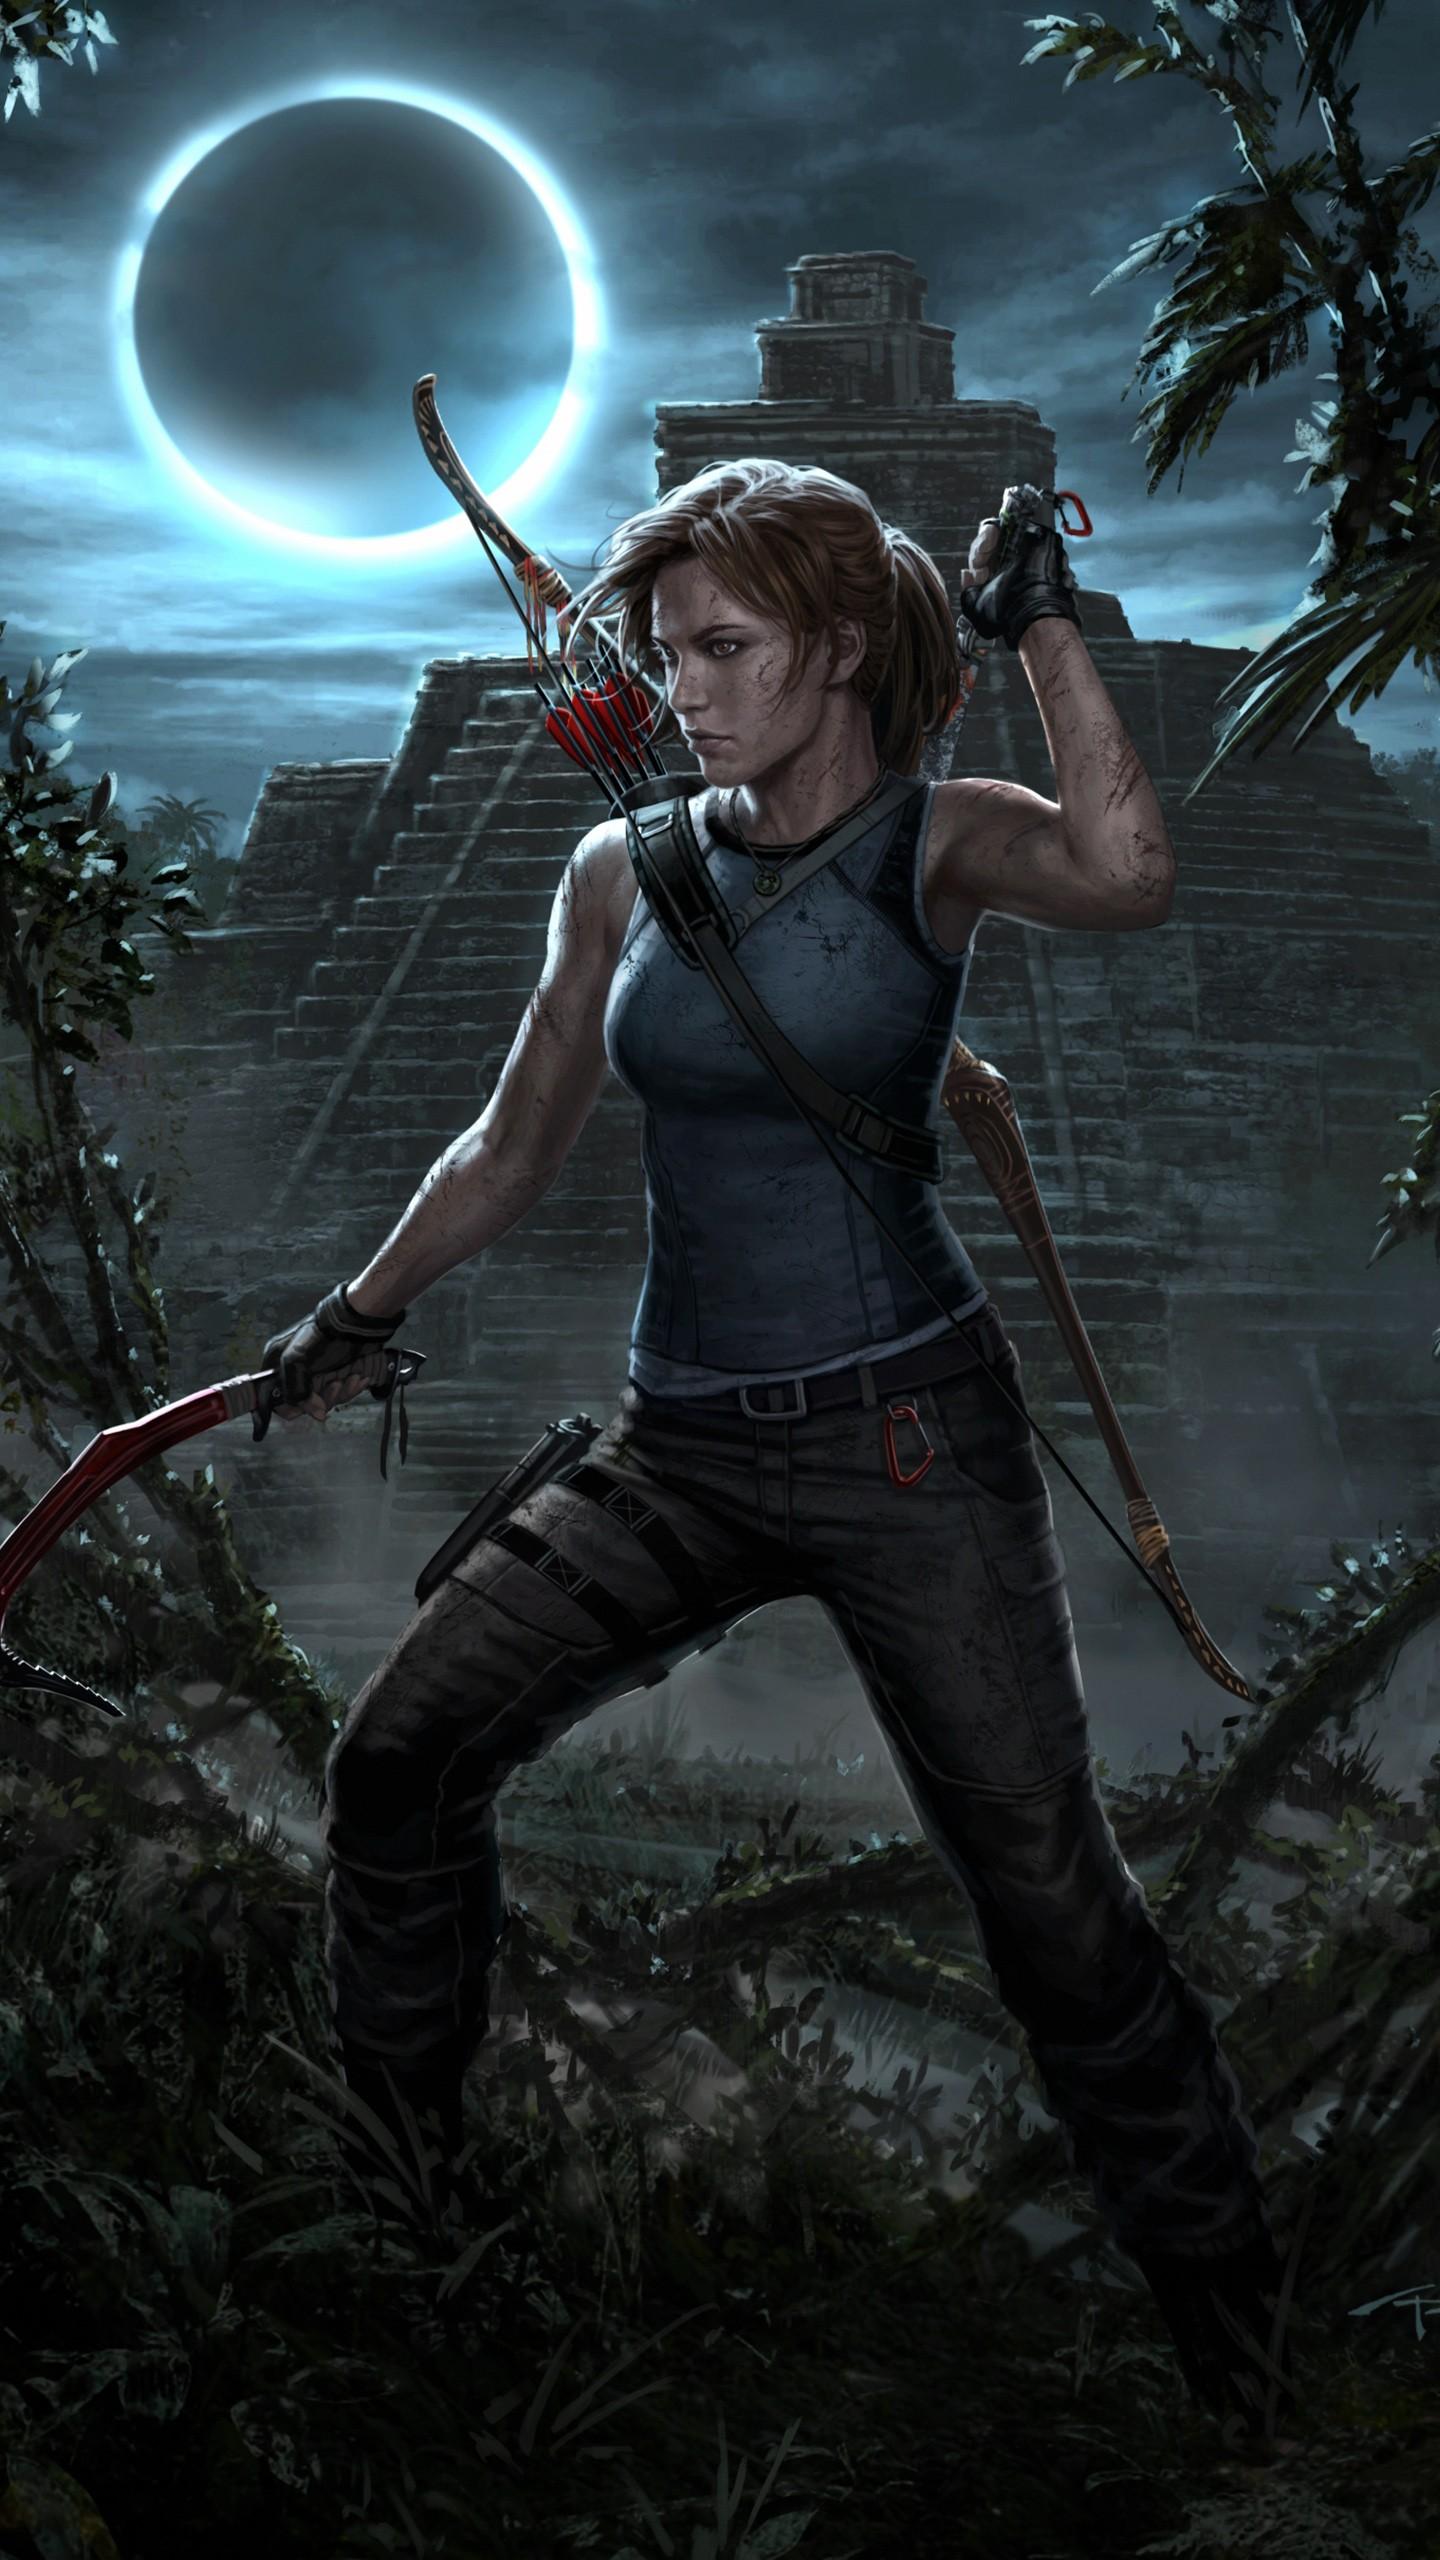 Tomb Raider Iphone 5 Wallpaper Shadow Of The Tomb Raider Lara Croft Wallpapers Hd